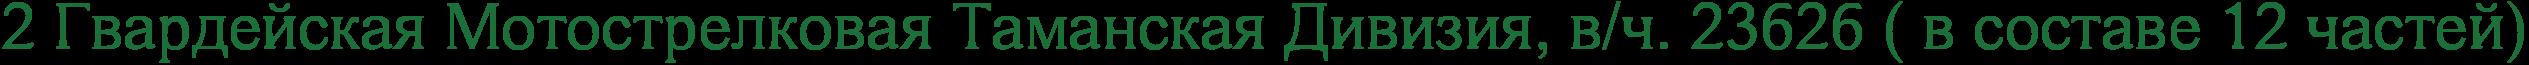 http://x-lines.ru/letters/i/cyrillicbasic/0031/1B703A/50/0/geopbr6osmembwcy4n4pbpqoz8eadwf44napdd3y4nqpbxstomem7wcb4gbpdygoszemzwf44n9pbcsosdea6egowmembwfh4napbxqto8emiwfo4g81bwrw4nhpbcsozdemxwfa4g81aegosez7db3qry3dgpt1gaonoegoseopdyqoz5eadwcn4napbcsoswodncty4gd7bcgto8eafwfi4nh11.png